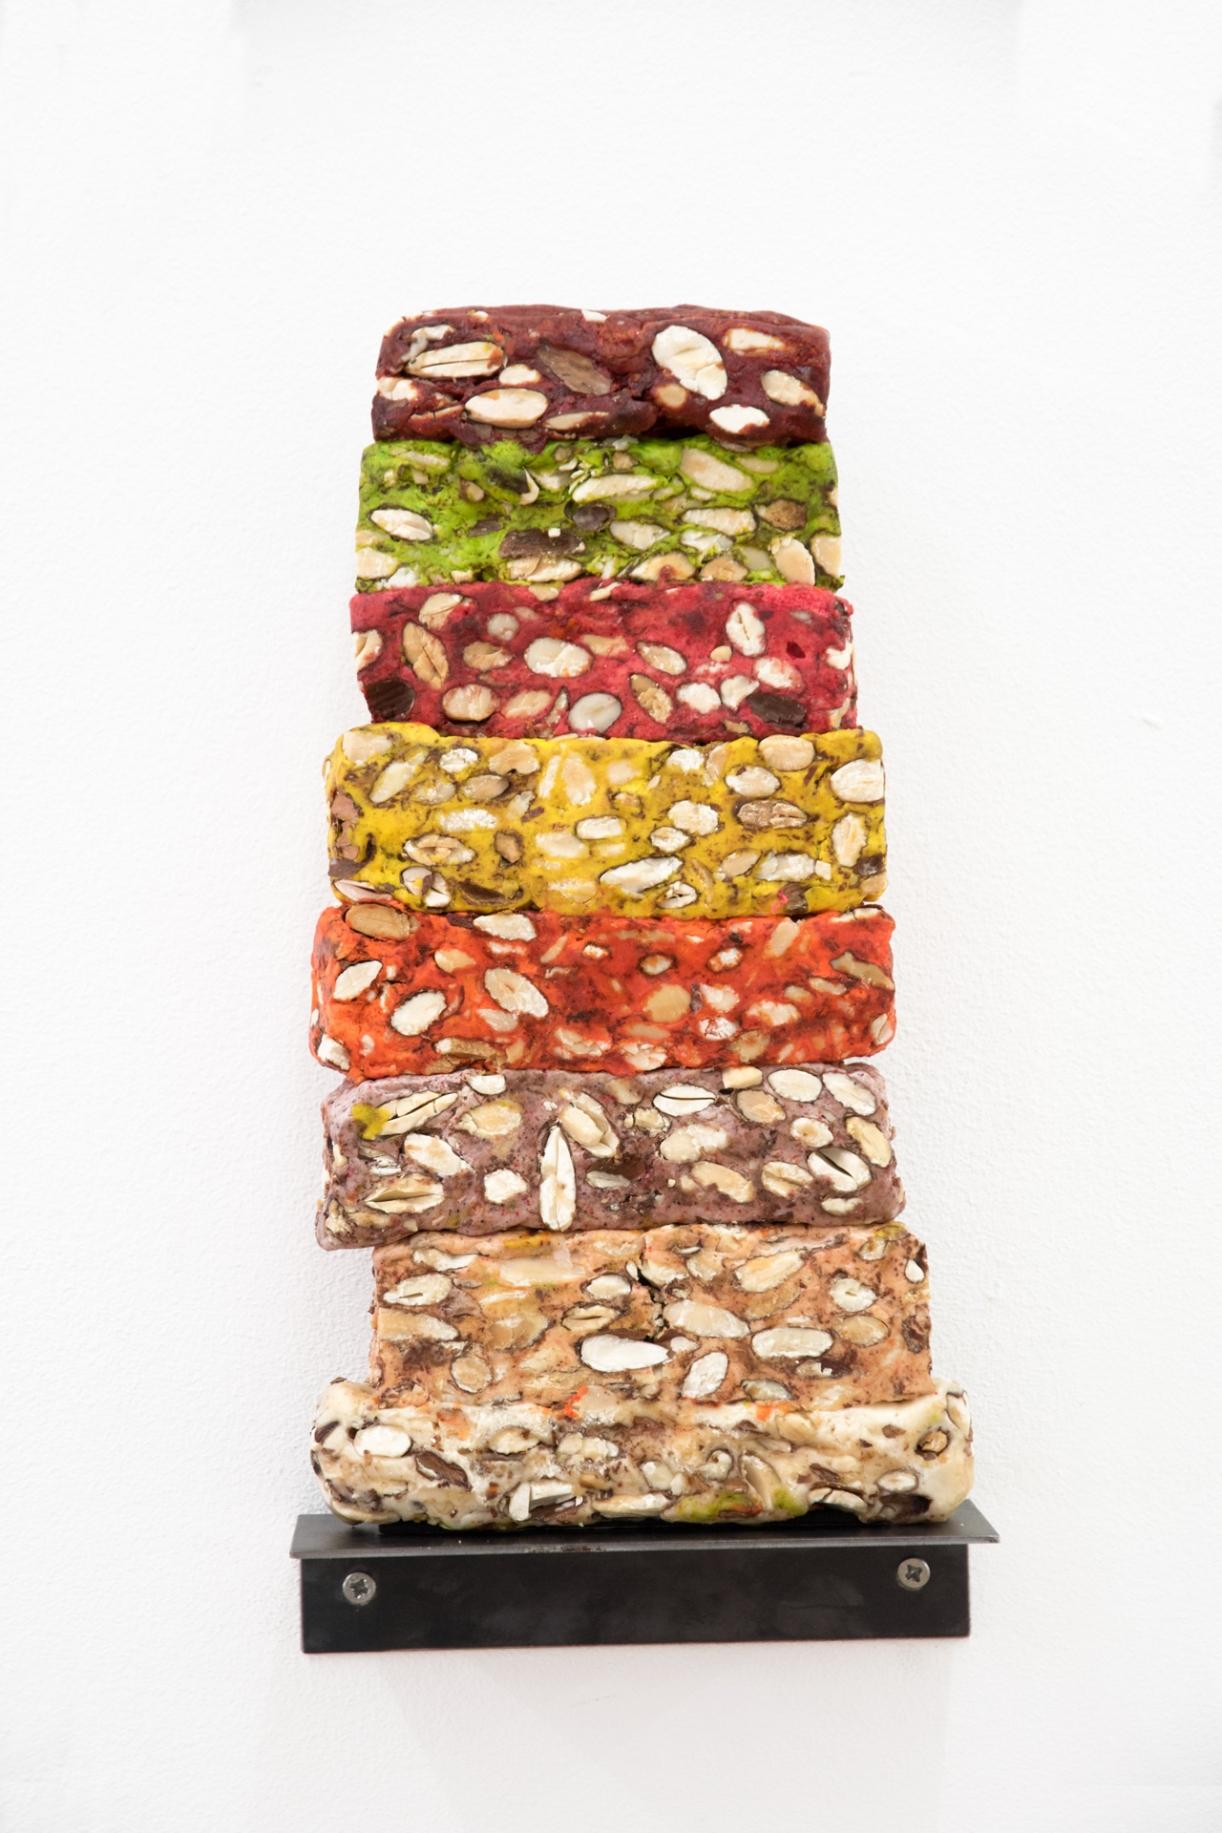 Untitled (Nougat Cross Section Flavor Sampler, fig.4), 2016, Moroccan sweets, vanished, 28 x 14.5 x 4.4 cm